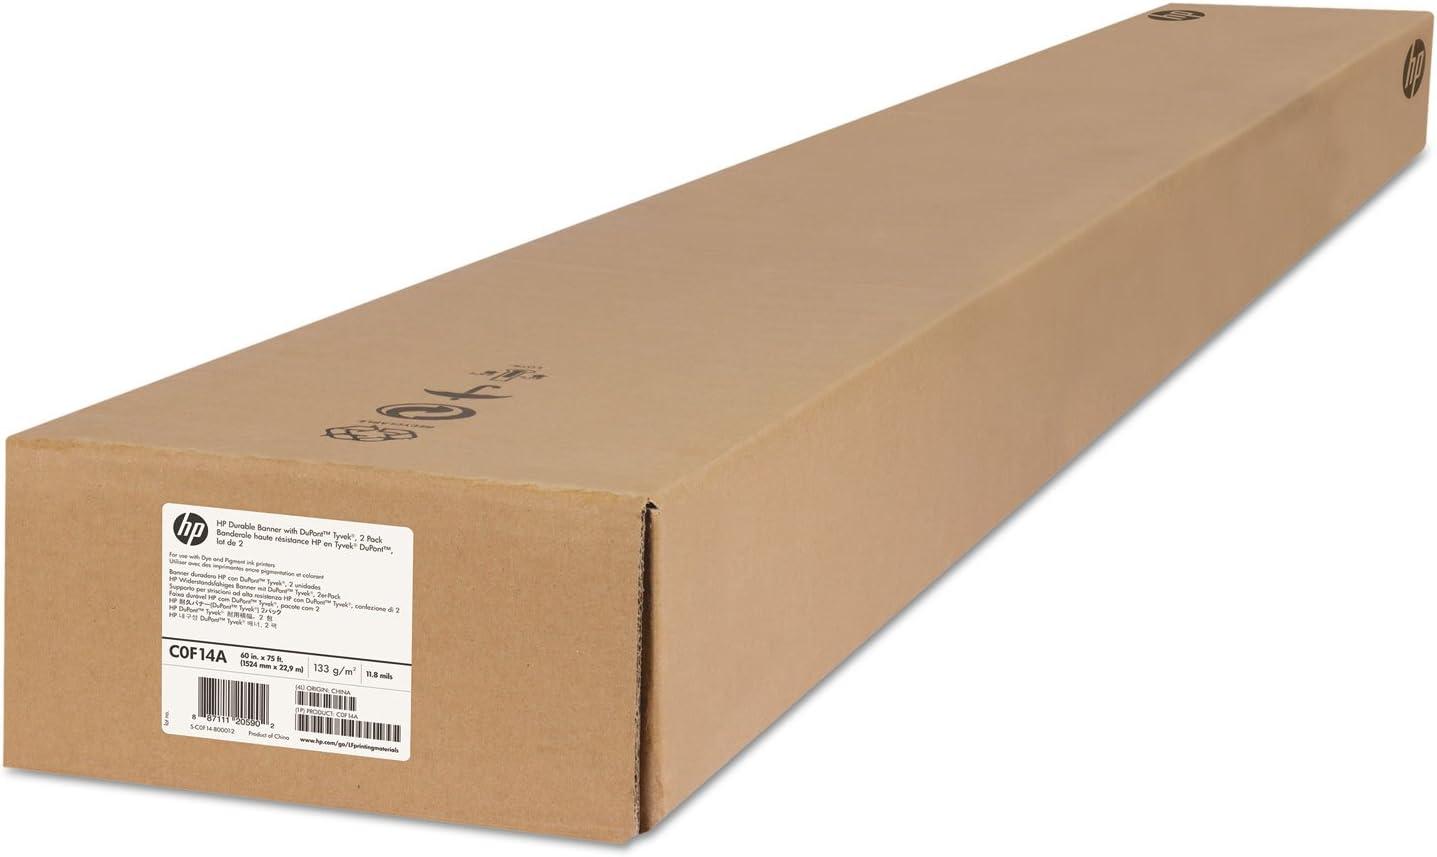 HEWC0F14A - HP Durable Banner Tyvek